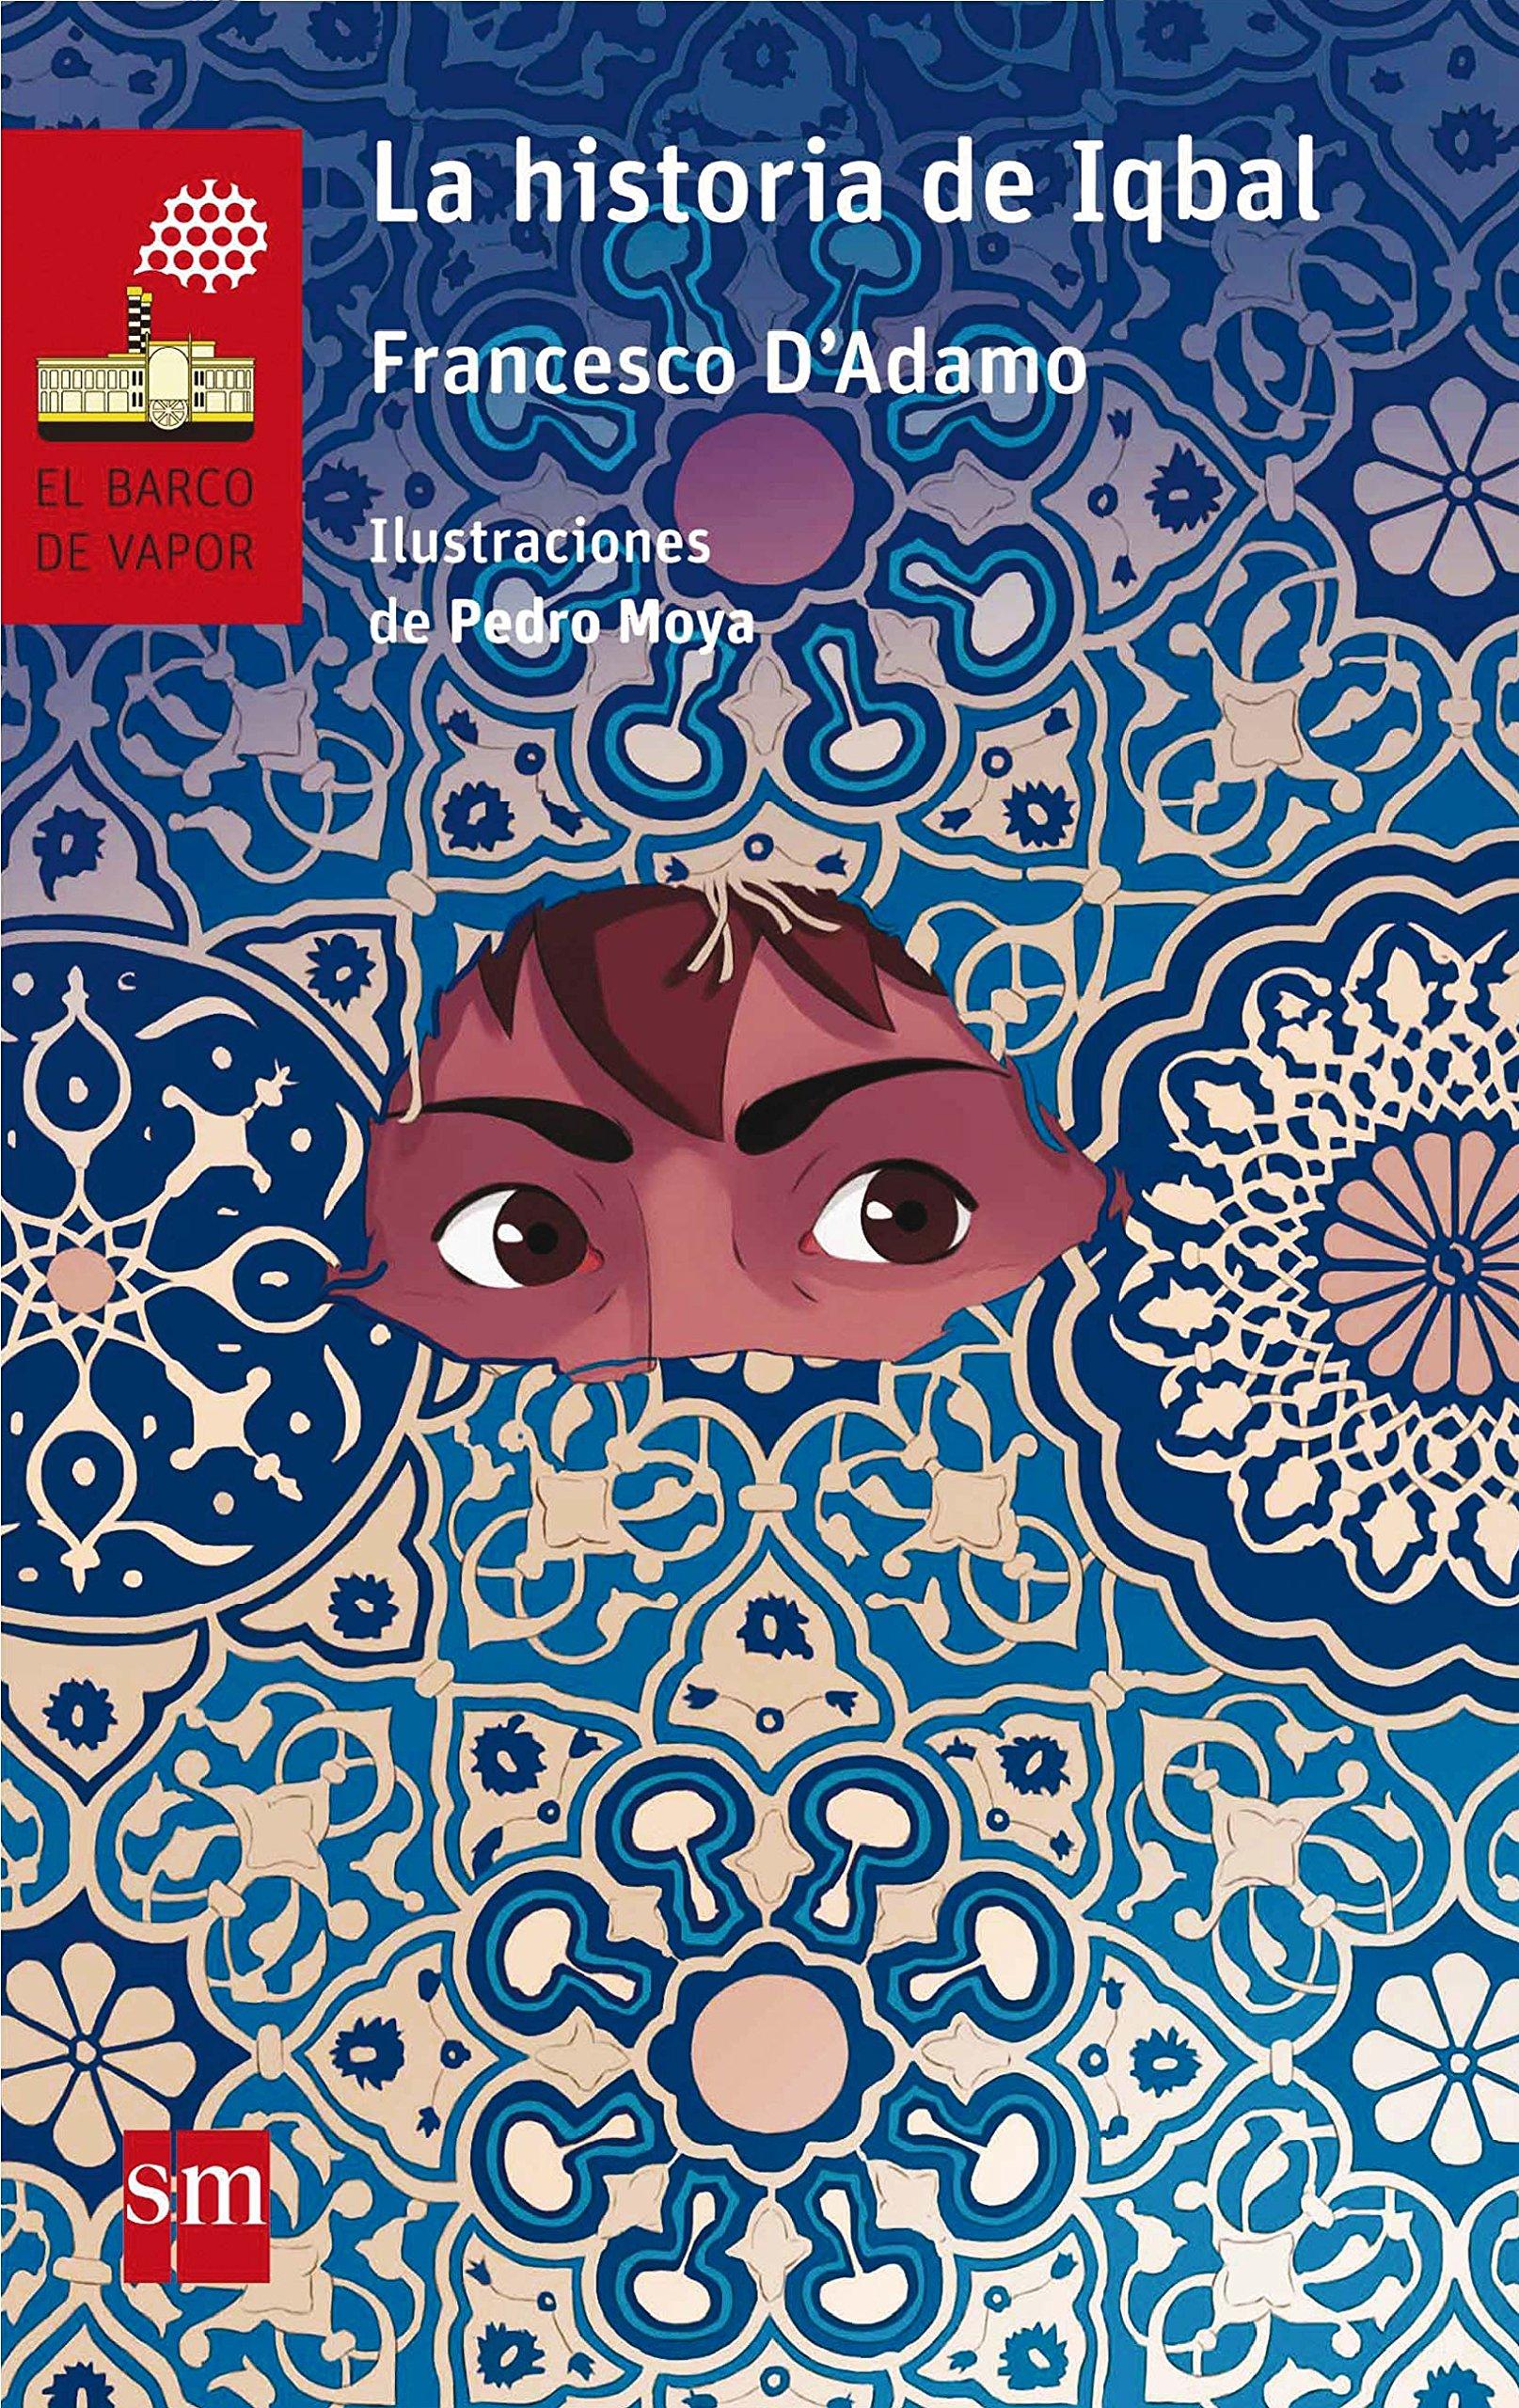 La historia de Iqbal: 157 (El Barco de Vapor Roja): Amazon.es: DAdamo, Francesco, Moya González, Pedro, Huguet, Rosa: Libros